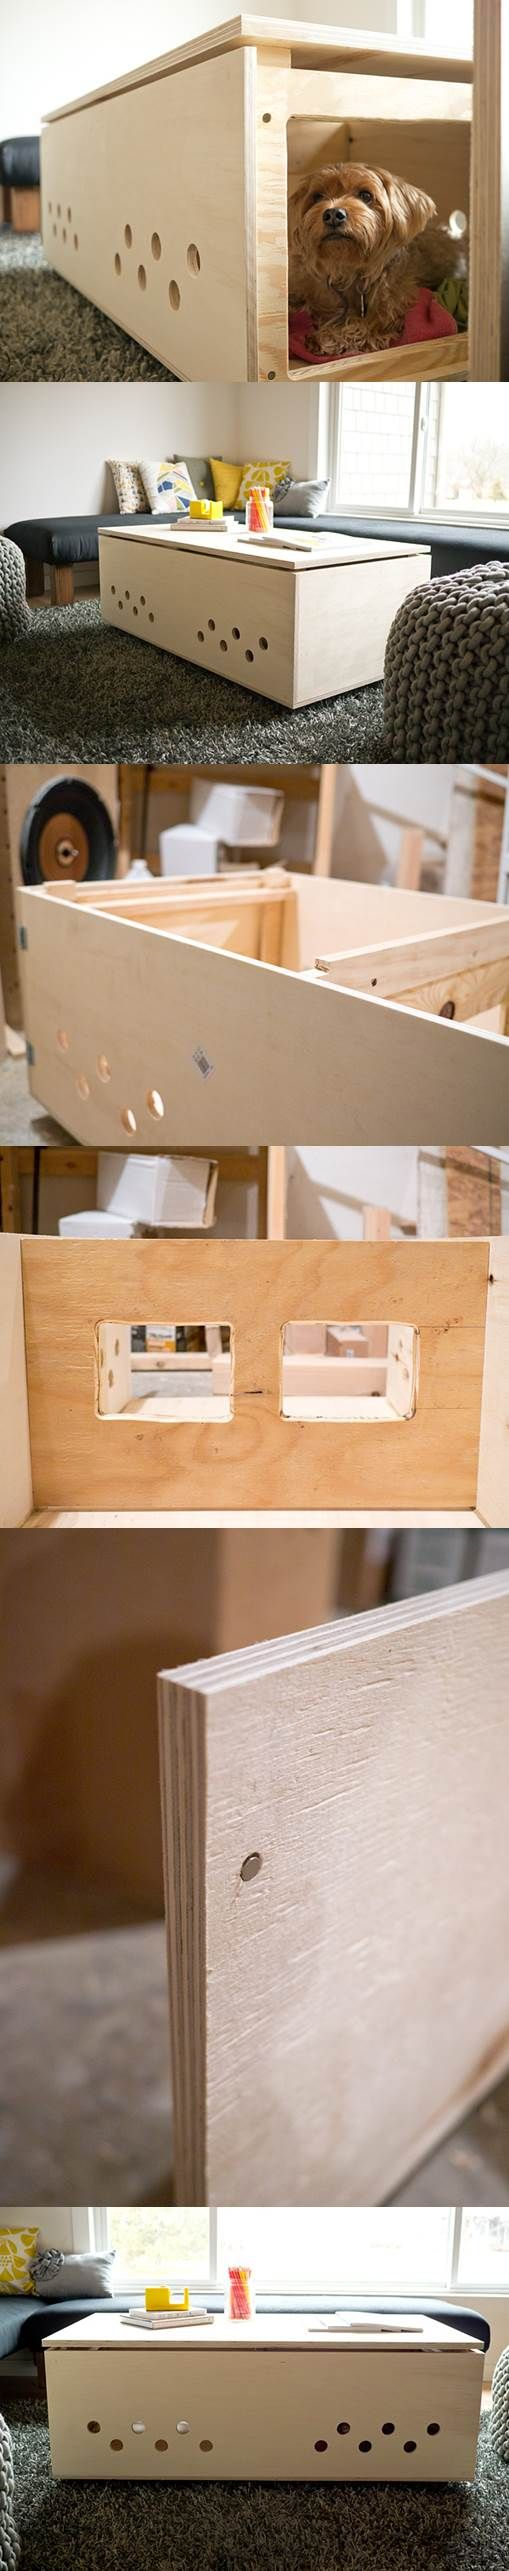 DIY Modern Pet Crate Coffee Table 2